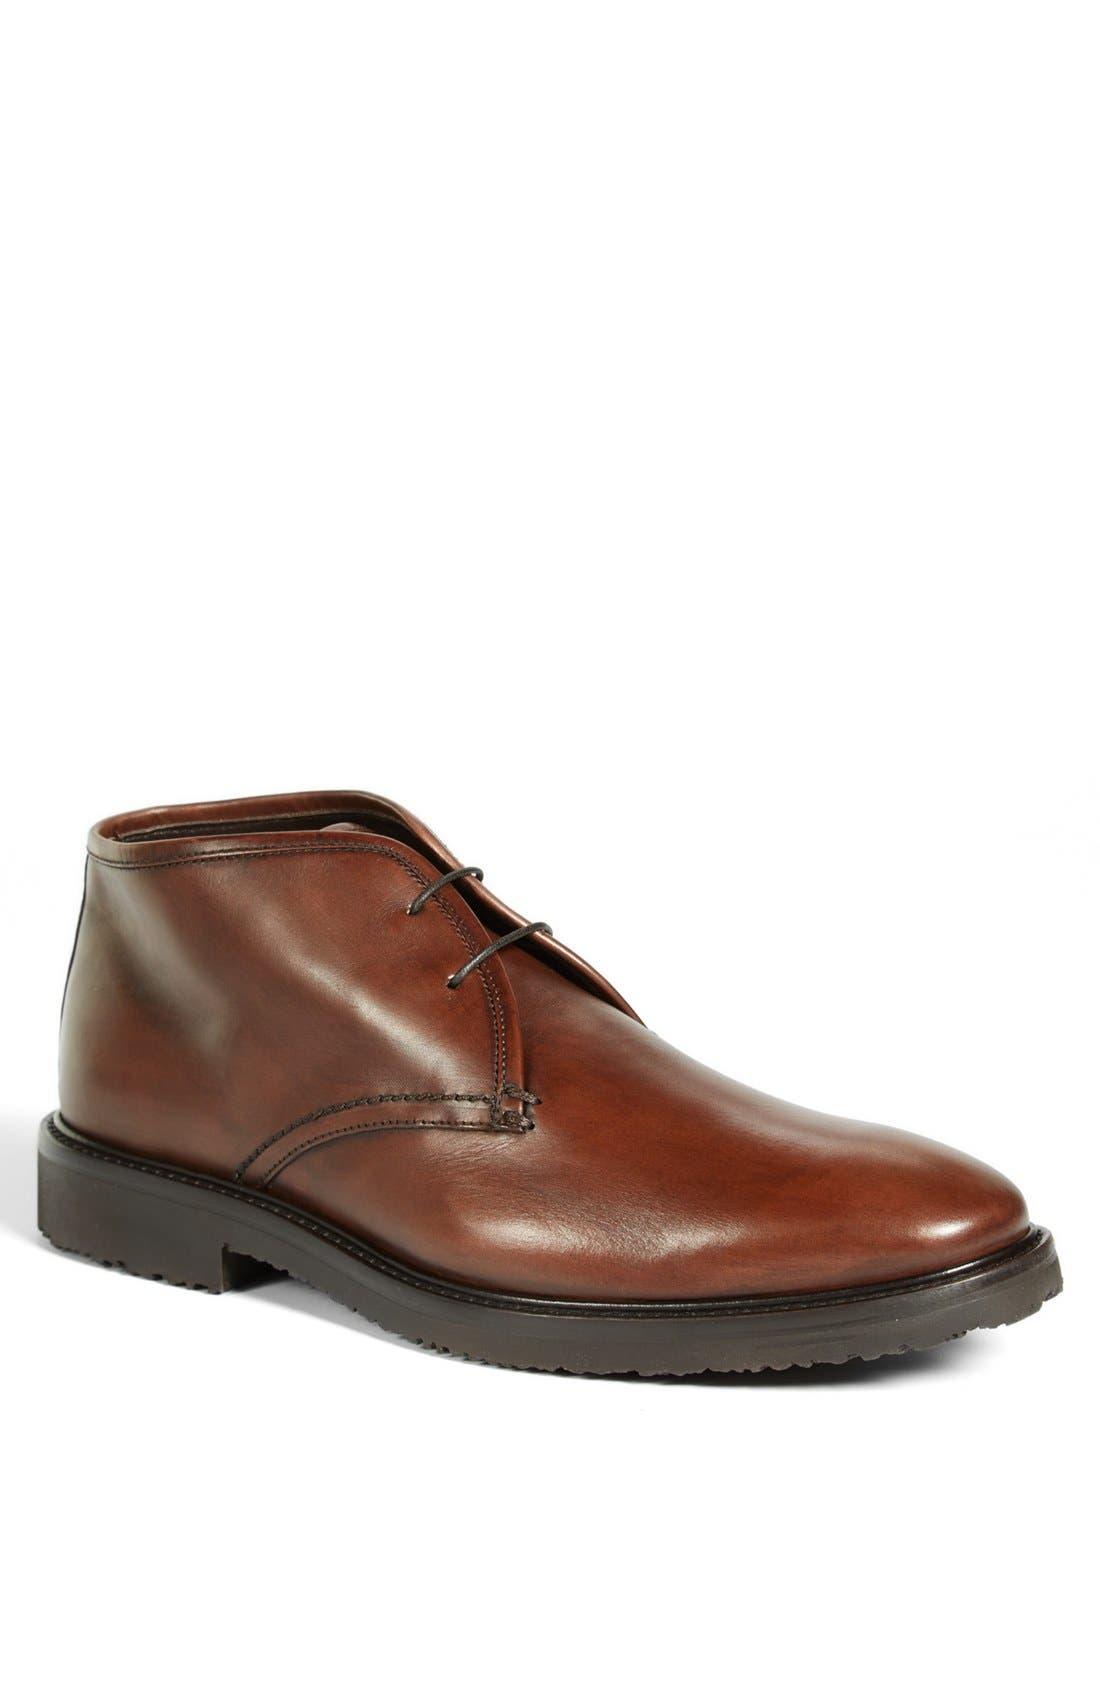 Main Image - Ermenegildo Zegna Leather Chukka Boot